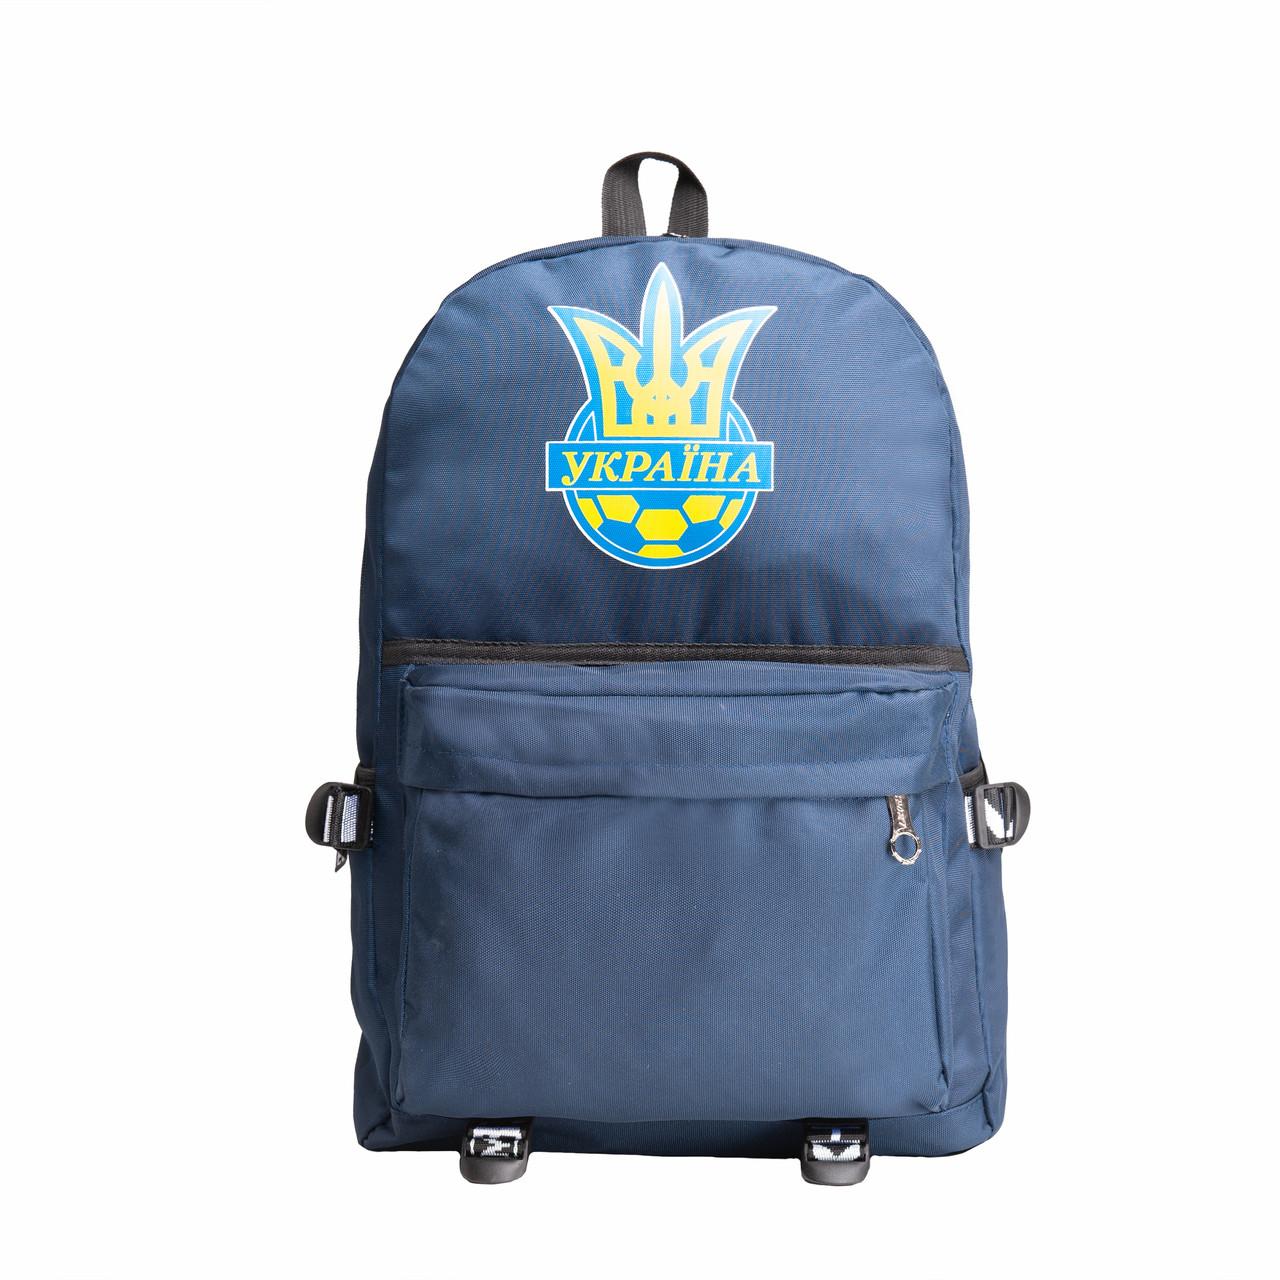 Рюкзак спортивный BagHouse 45х33х14 ткань нейлон синий ксСТ041син